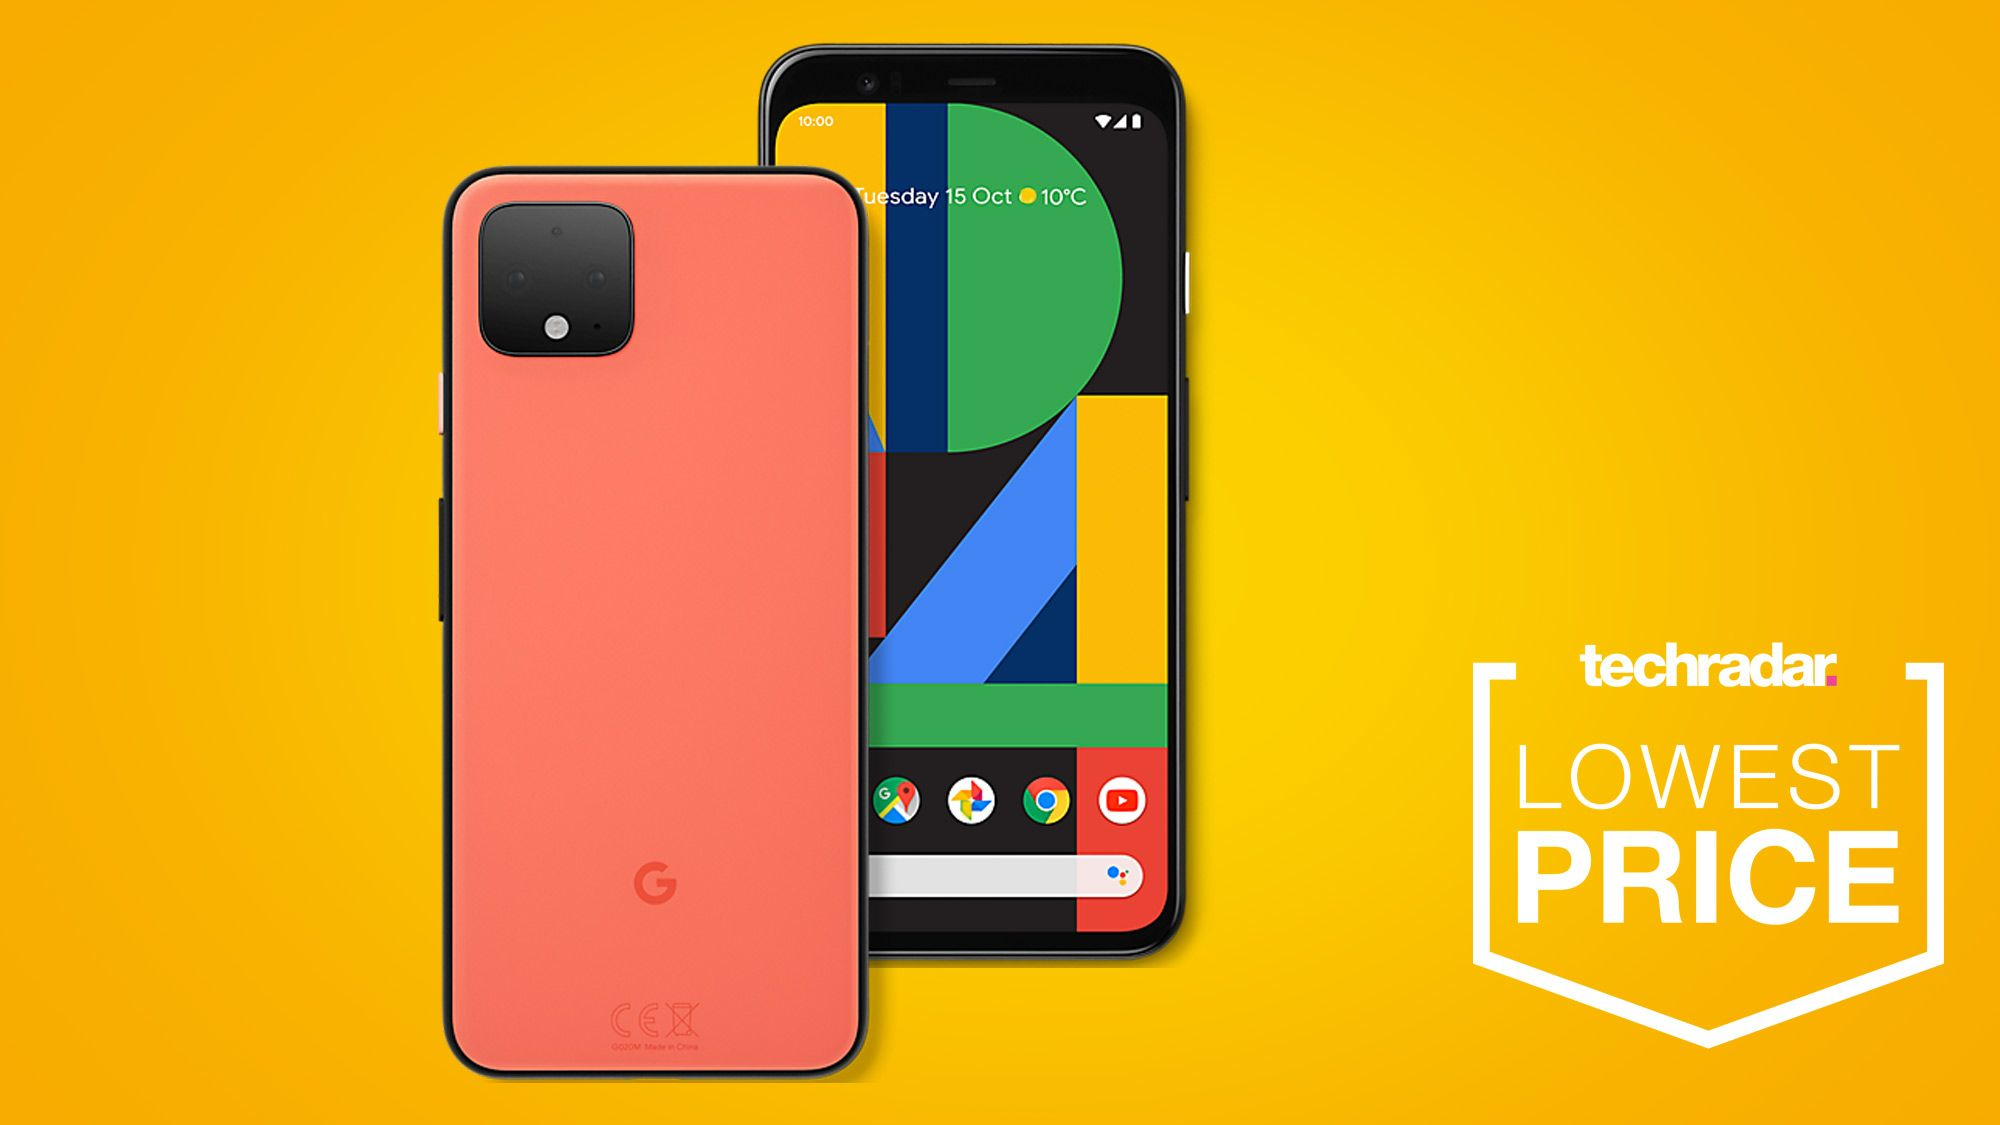 Christmas 2021 Iphone Deals The Best Google Pixel 4 Deals And Sales For May 2021 Google Pixel Best Iphone Deals Iphone Deals